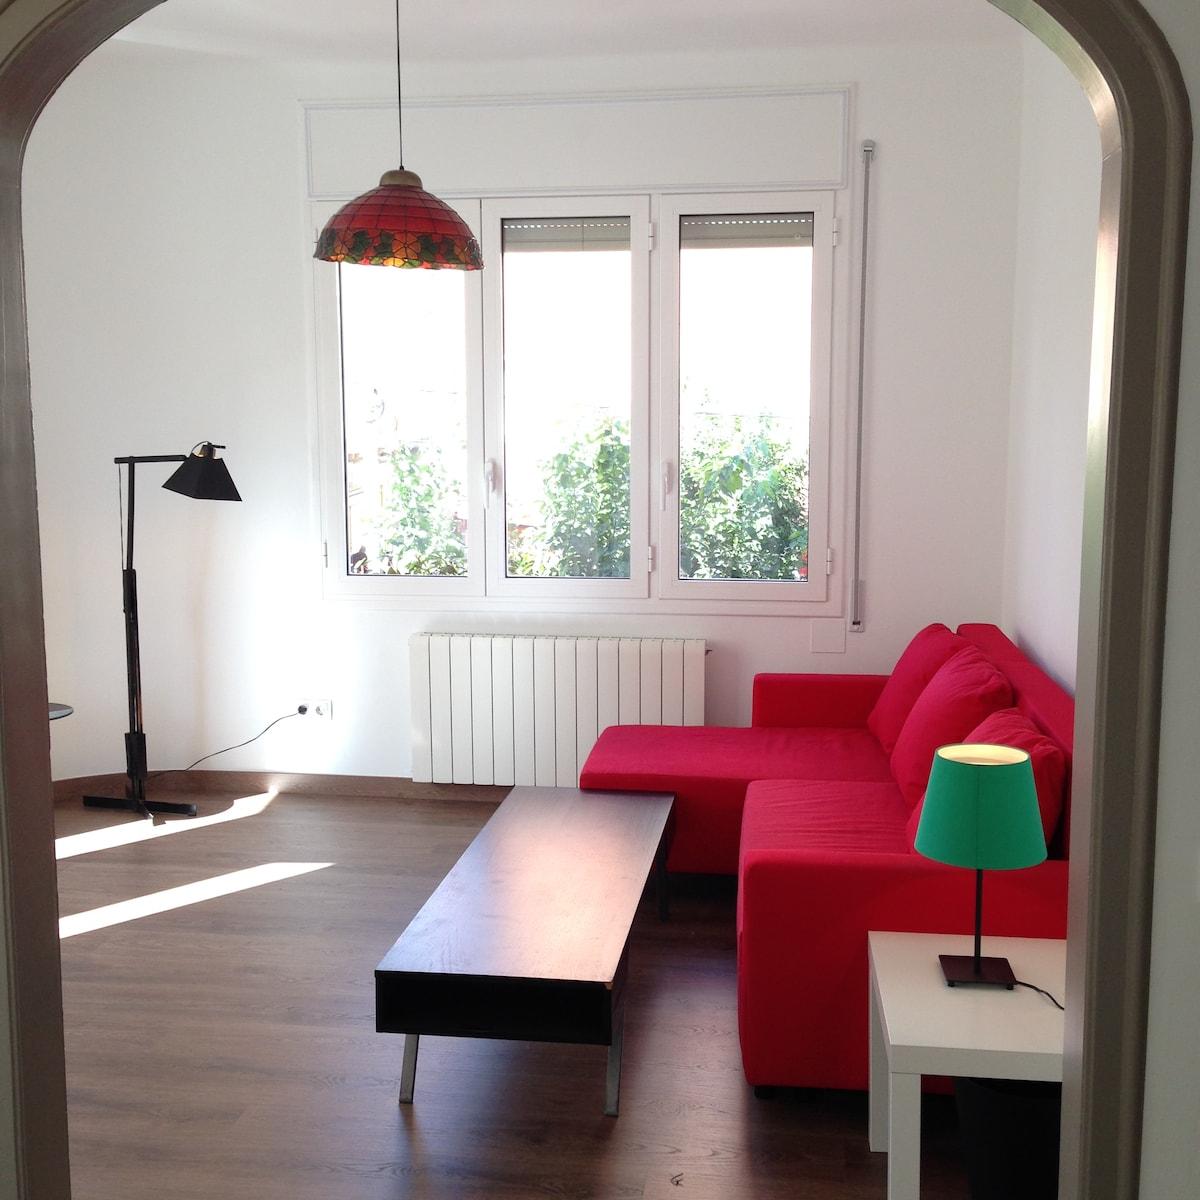 Encantador apartamento